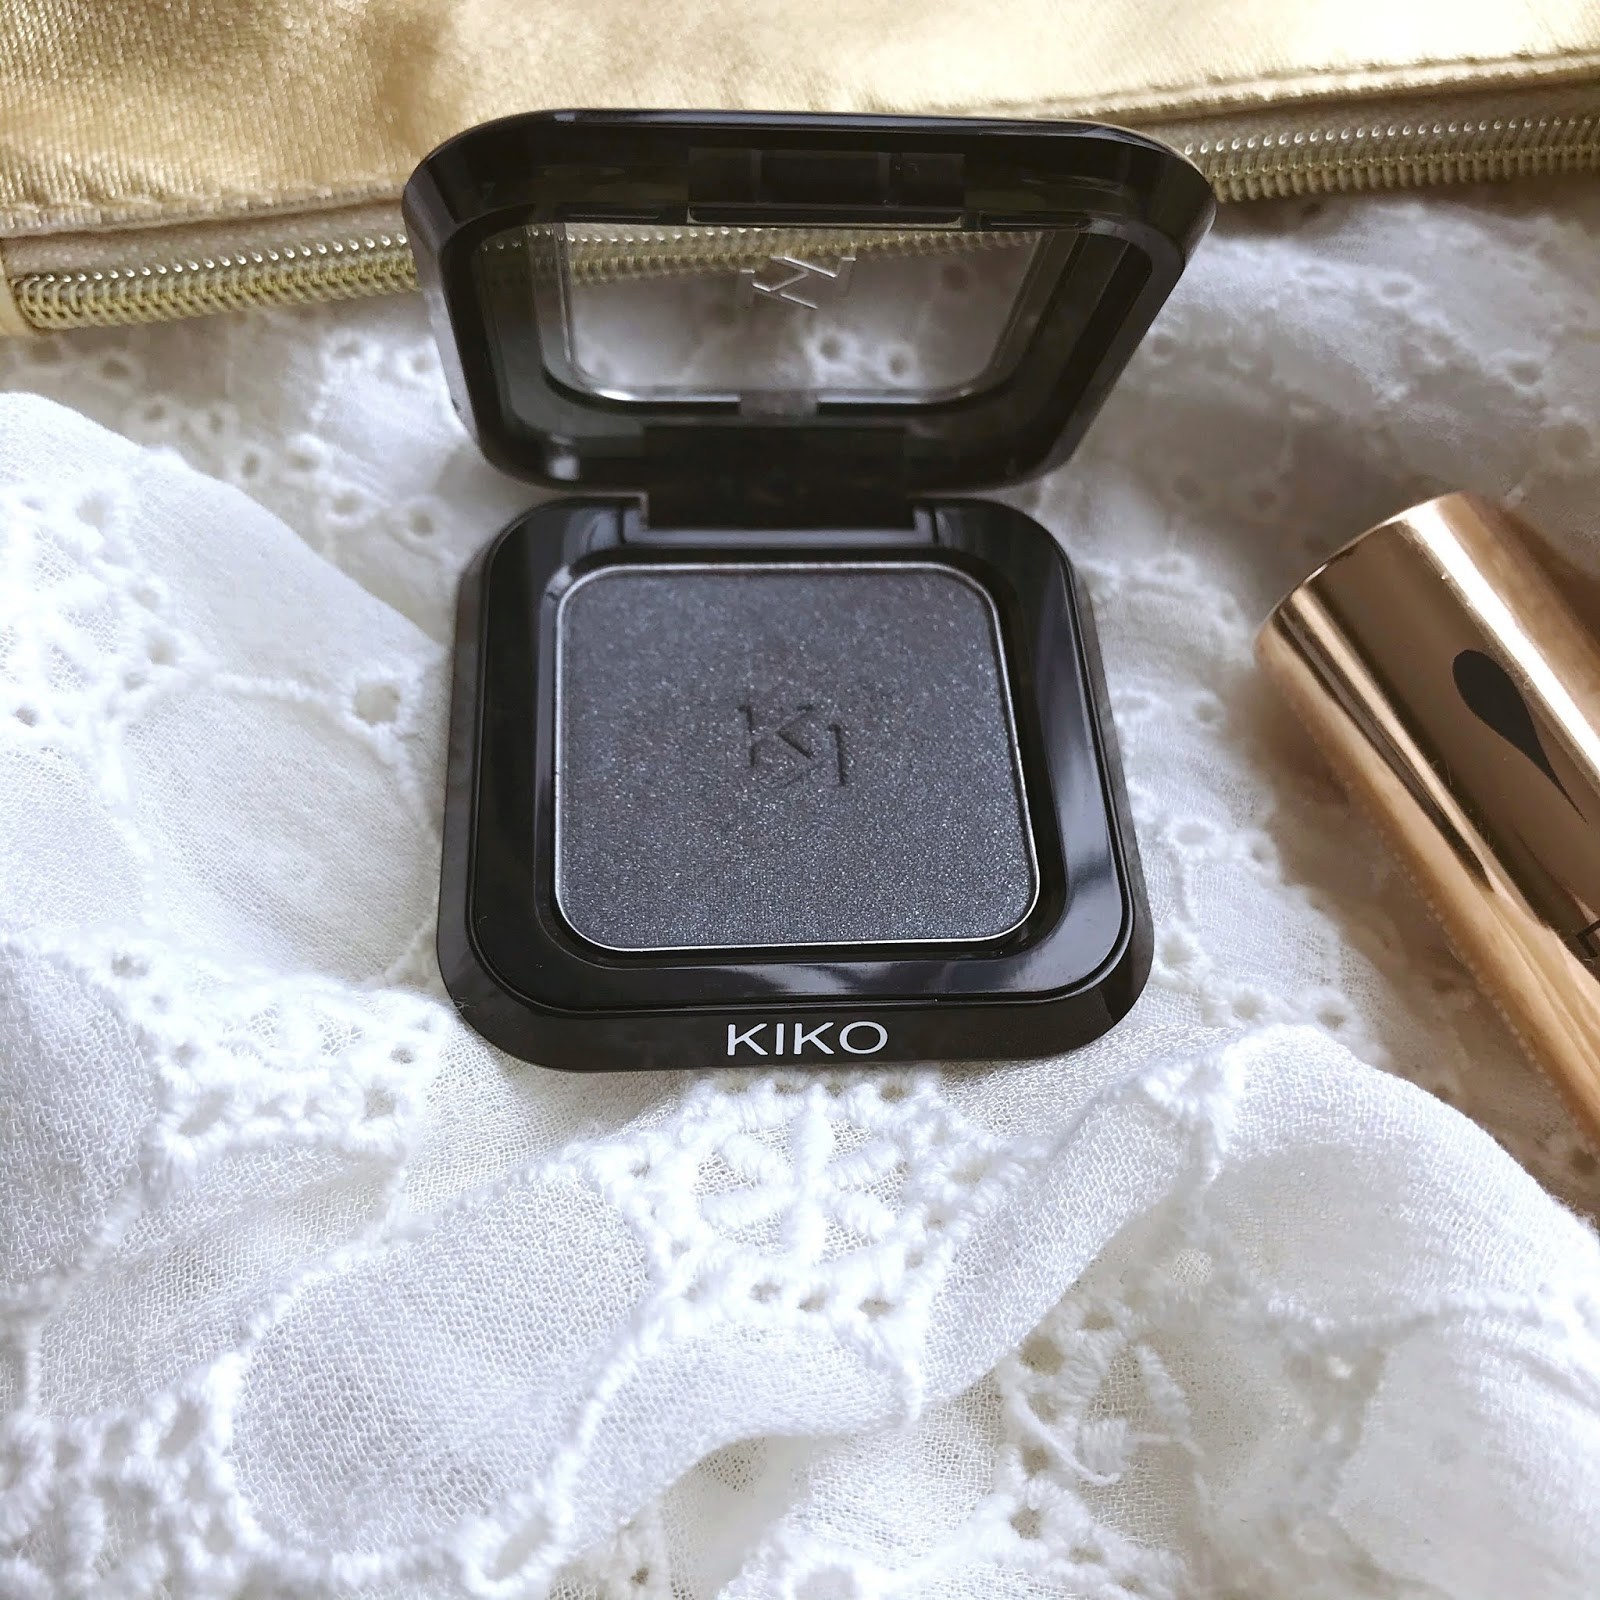 Ombre à paupières High pigment wet and dry eyeshadow Kiko